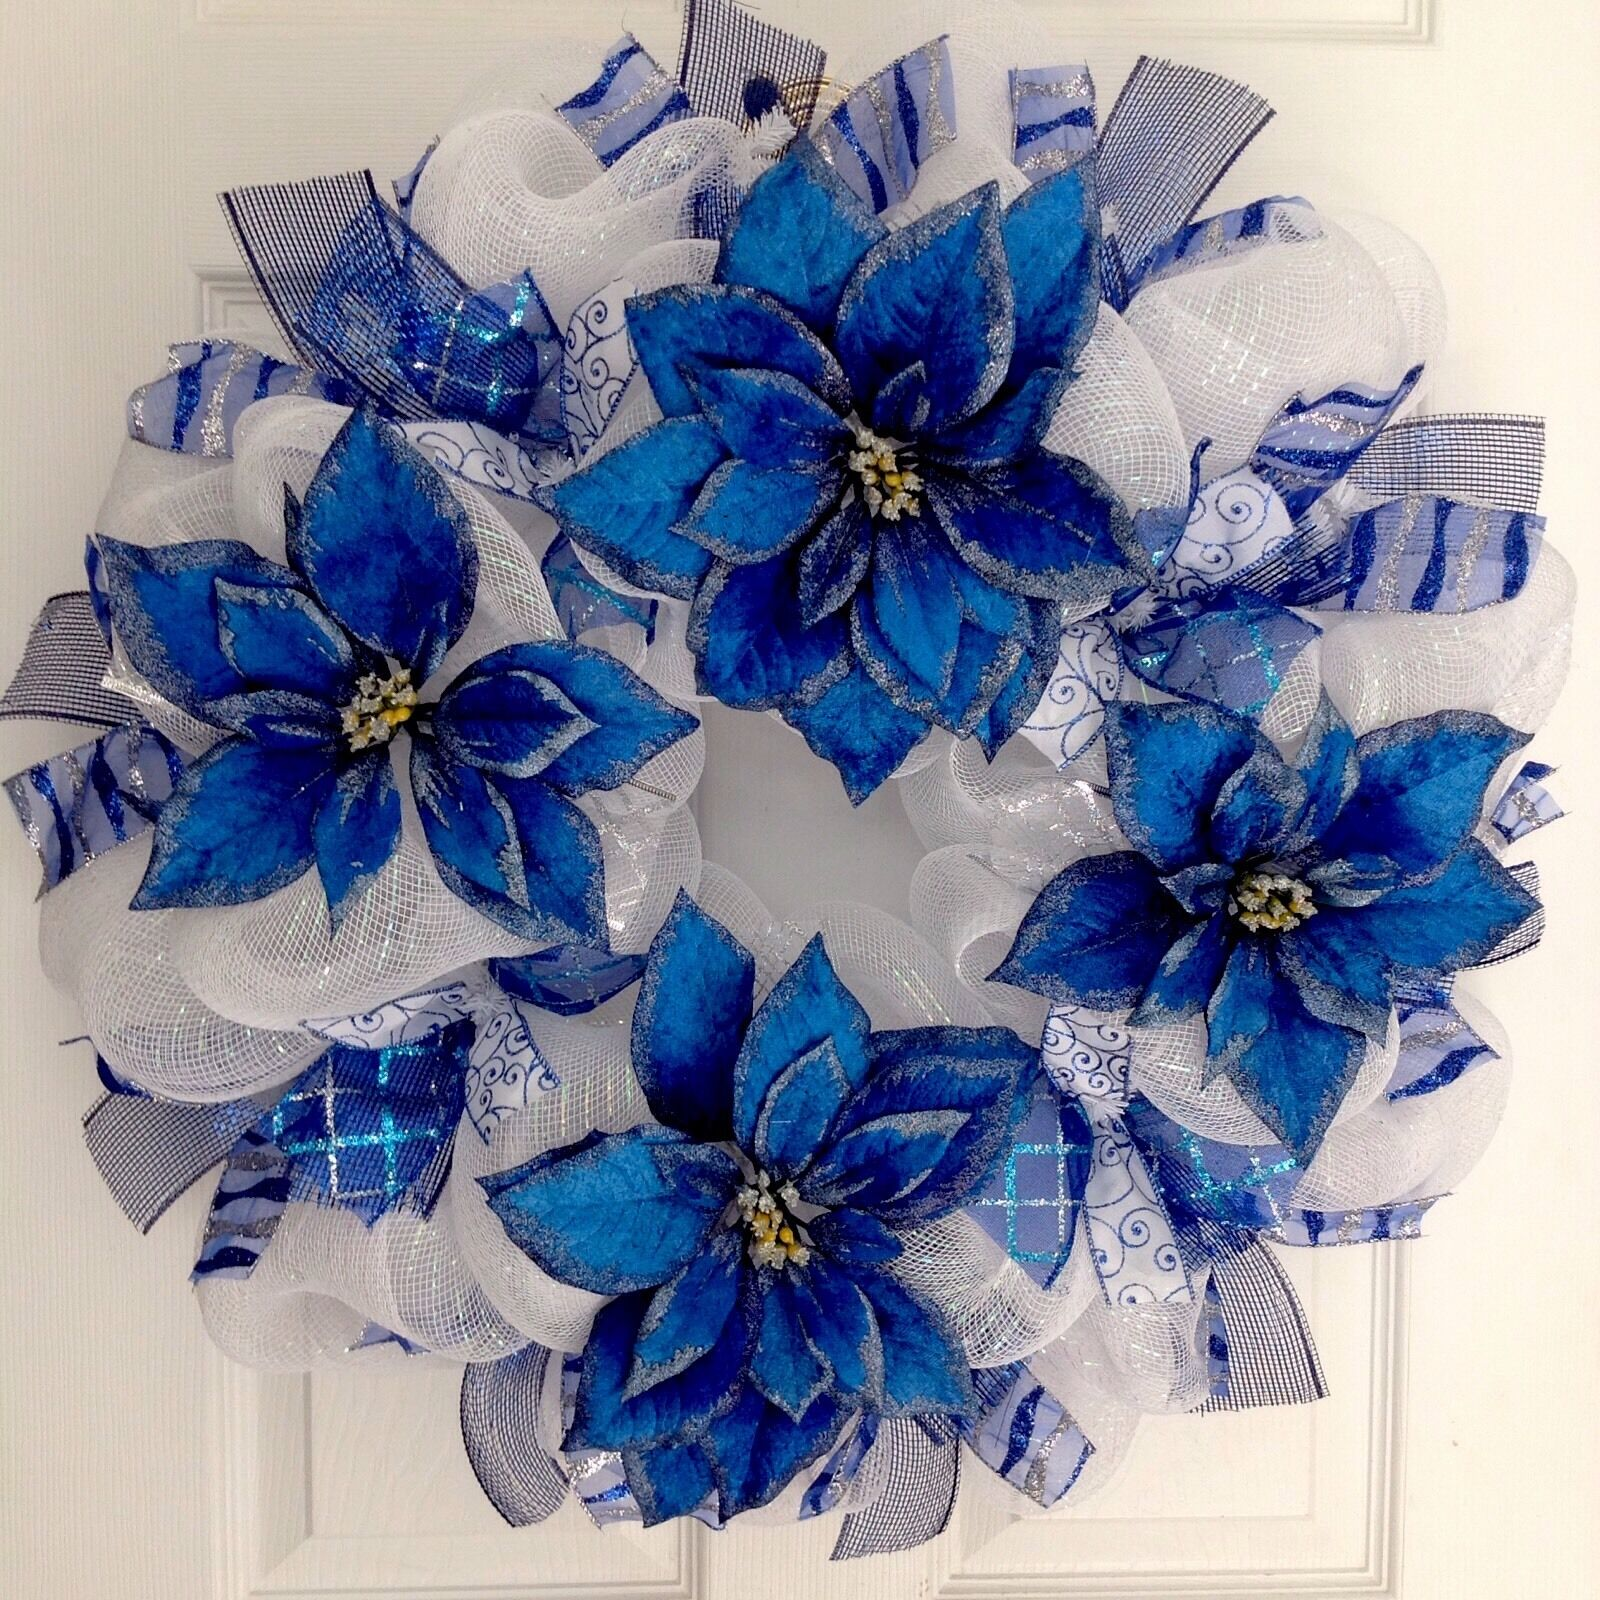 Blue Christmas Wreaths | Christmas Wikii